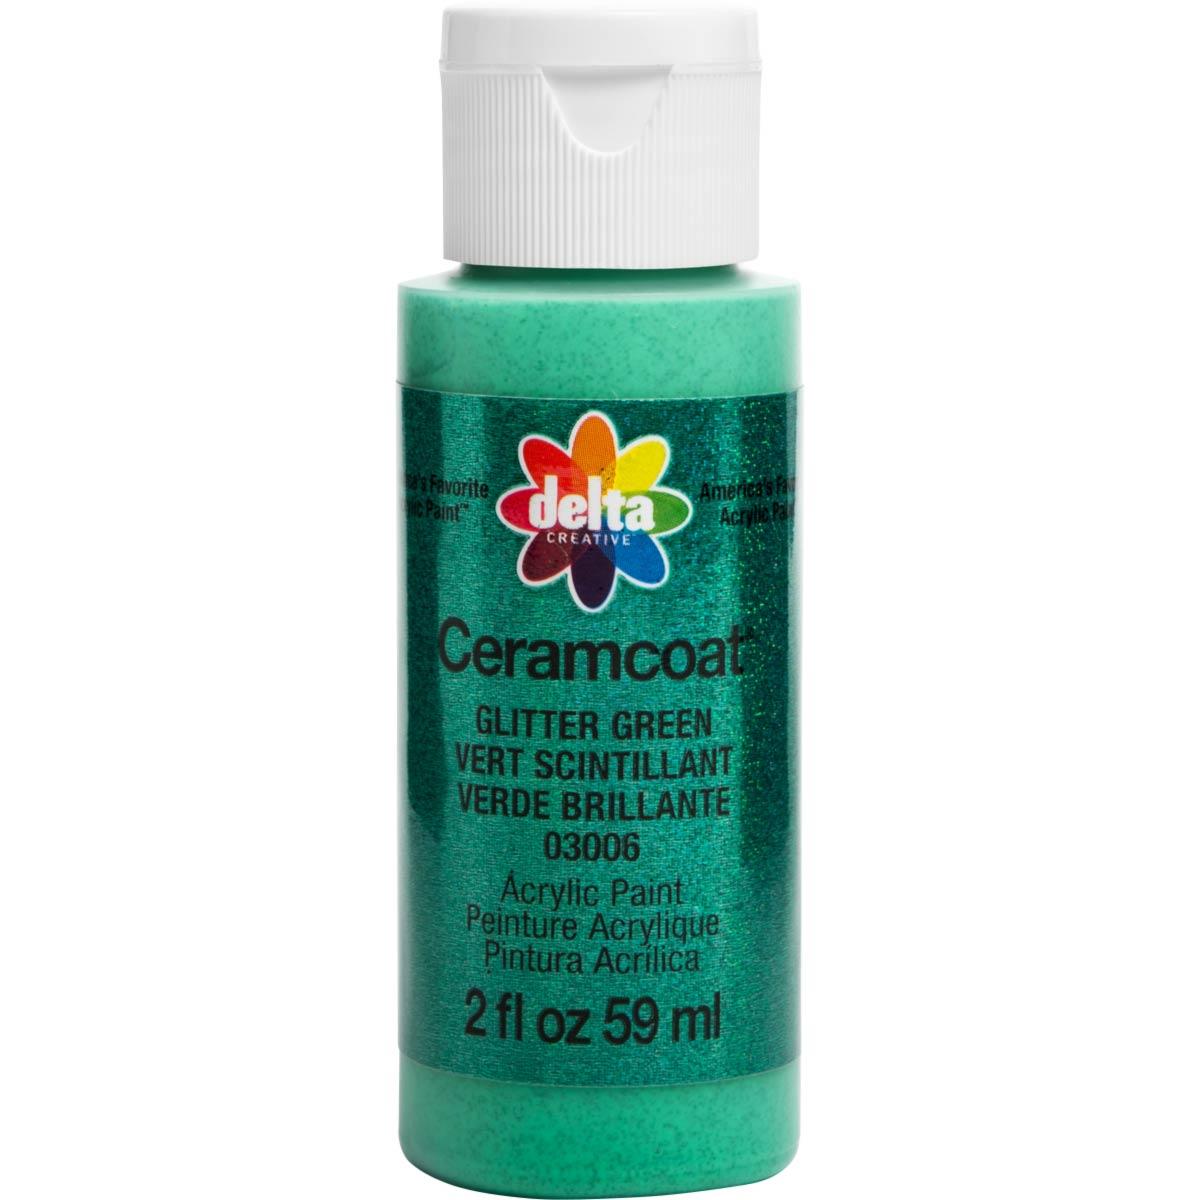 Delta Ceramcoat ® Acrylic Paint - Glitter Green, 2 oz.